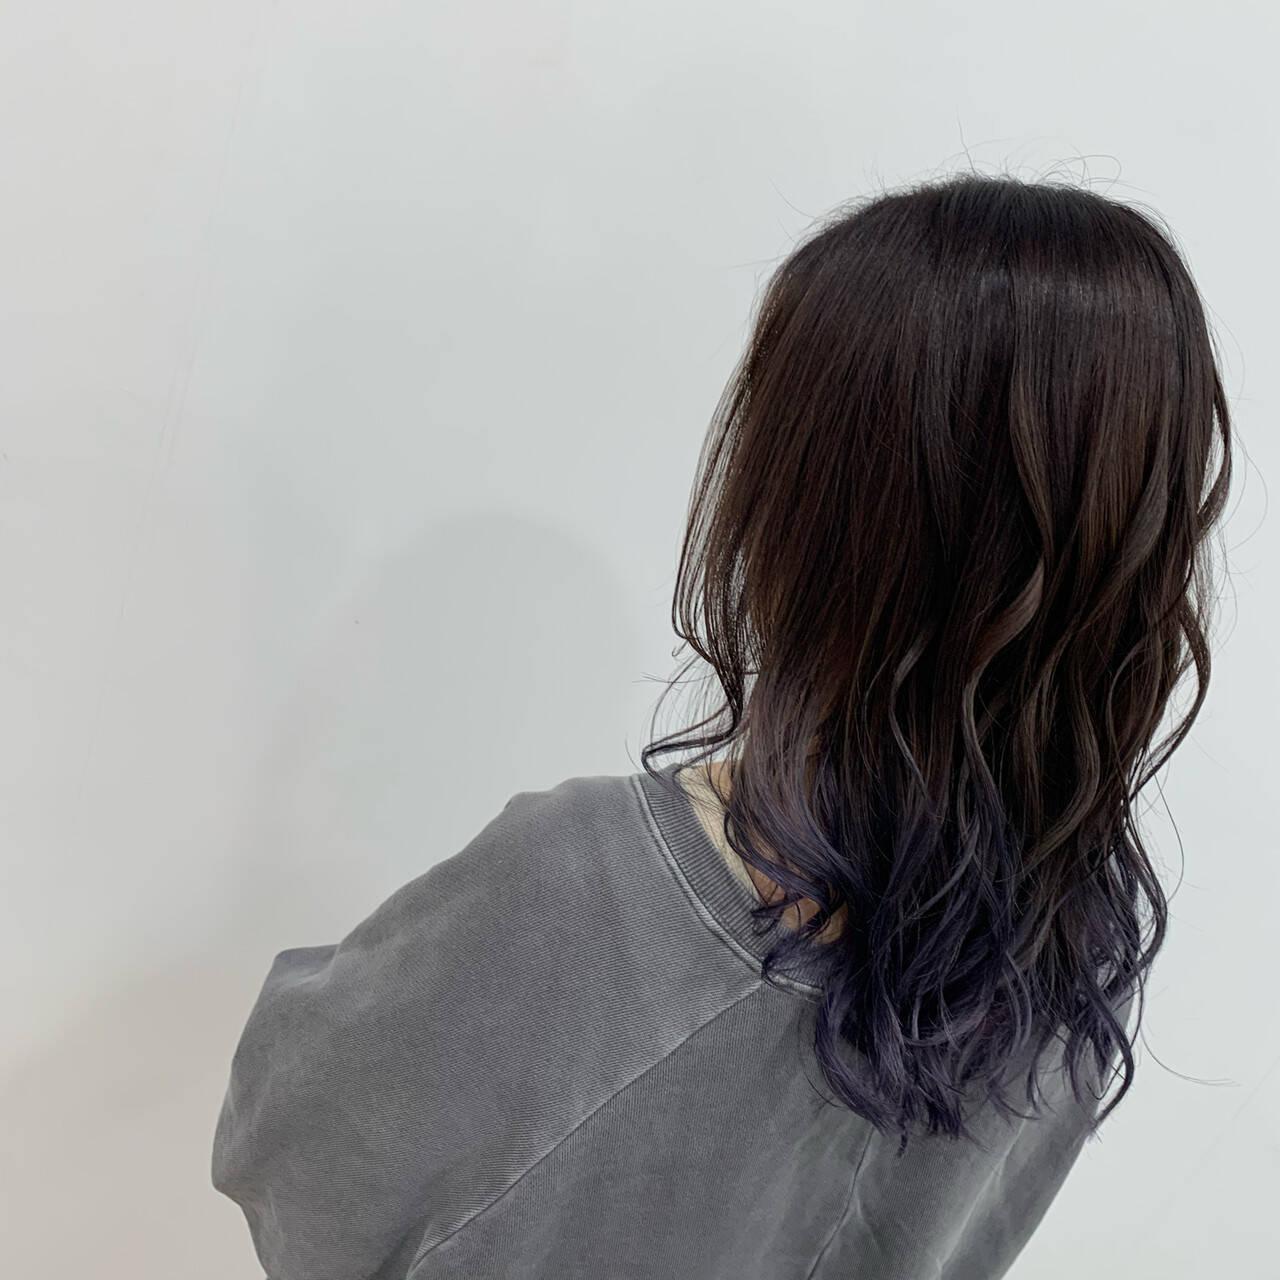 N.オイル ブルーラベンダー グラデーションカラー ブリーチヘアスタイルや髪型の写真・画像